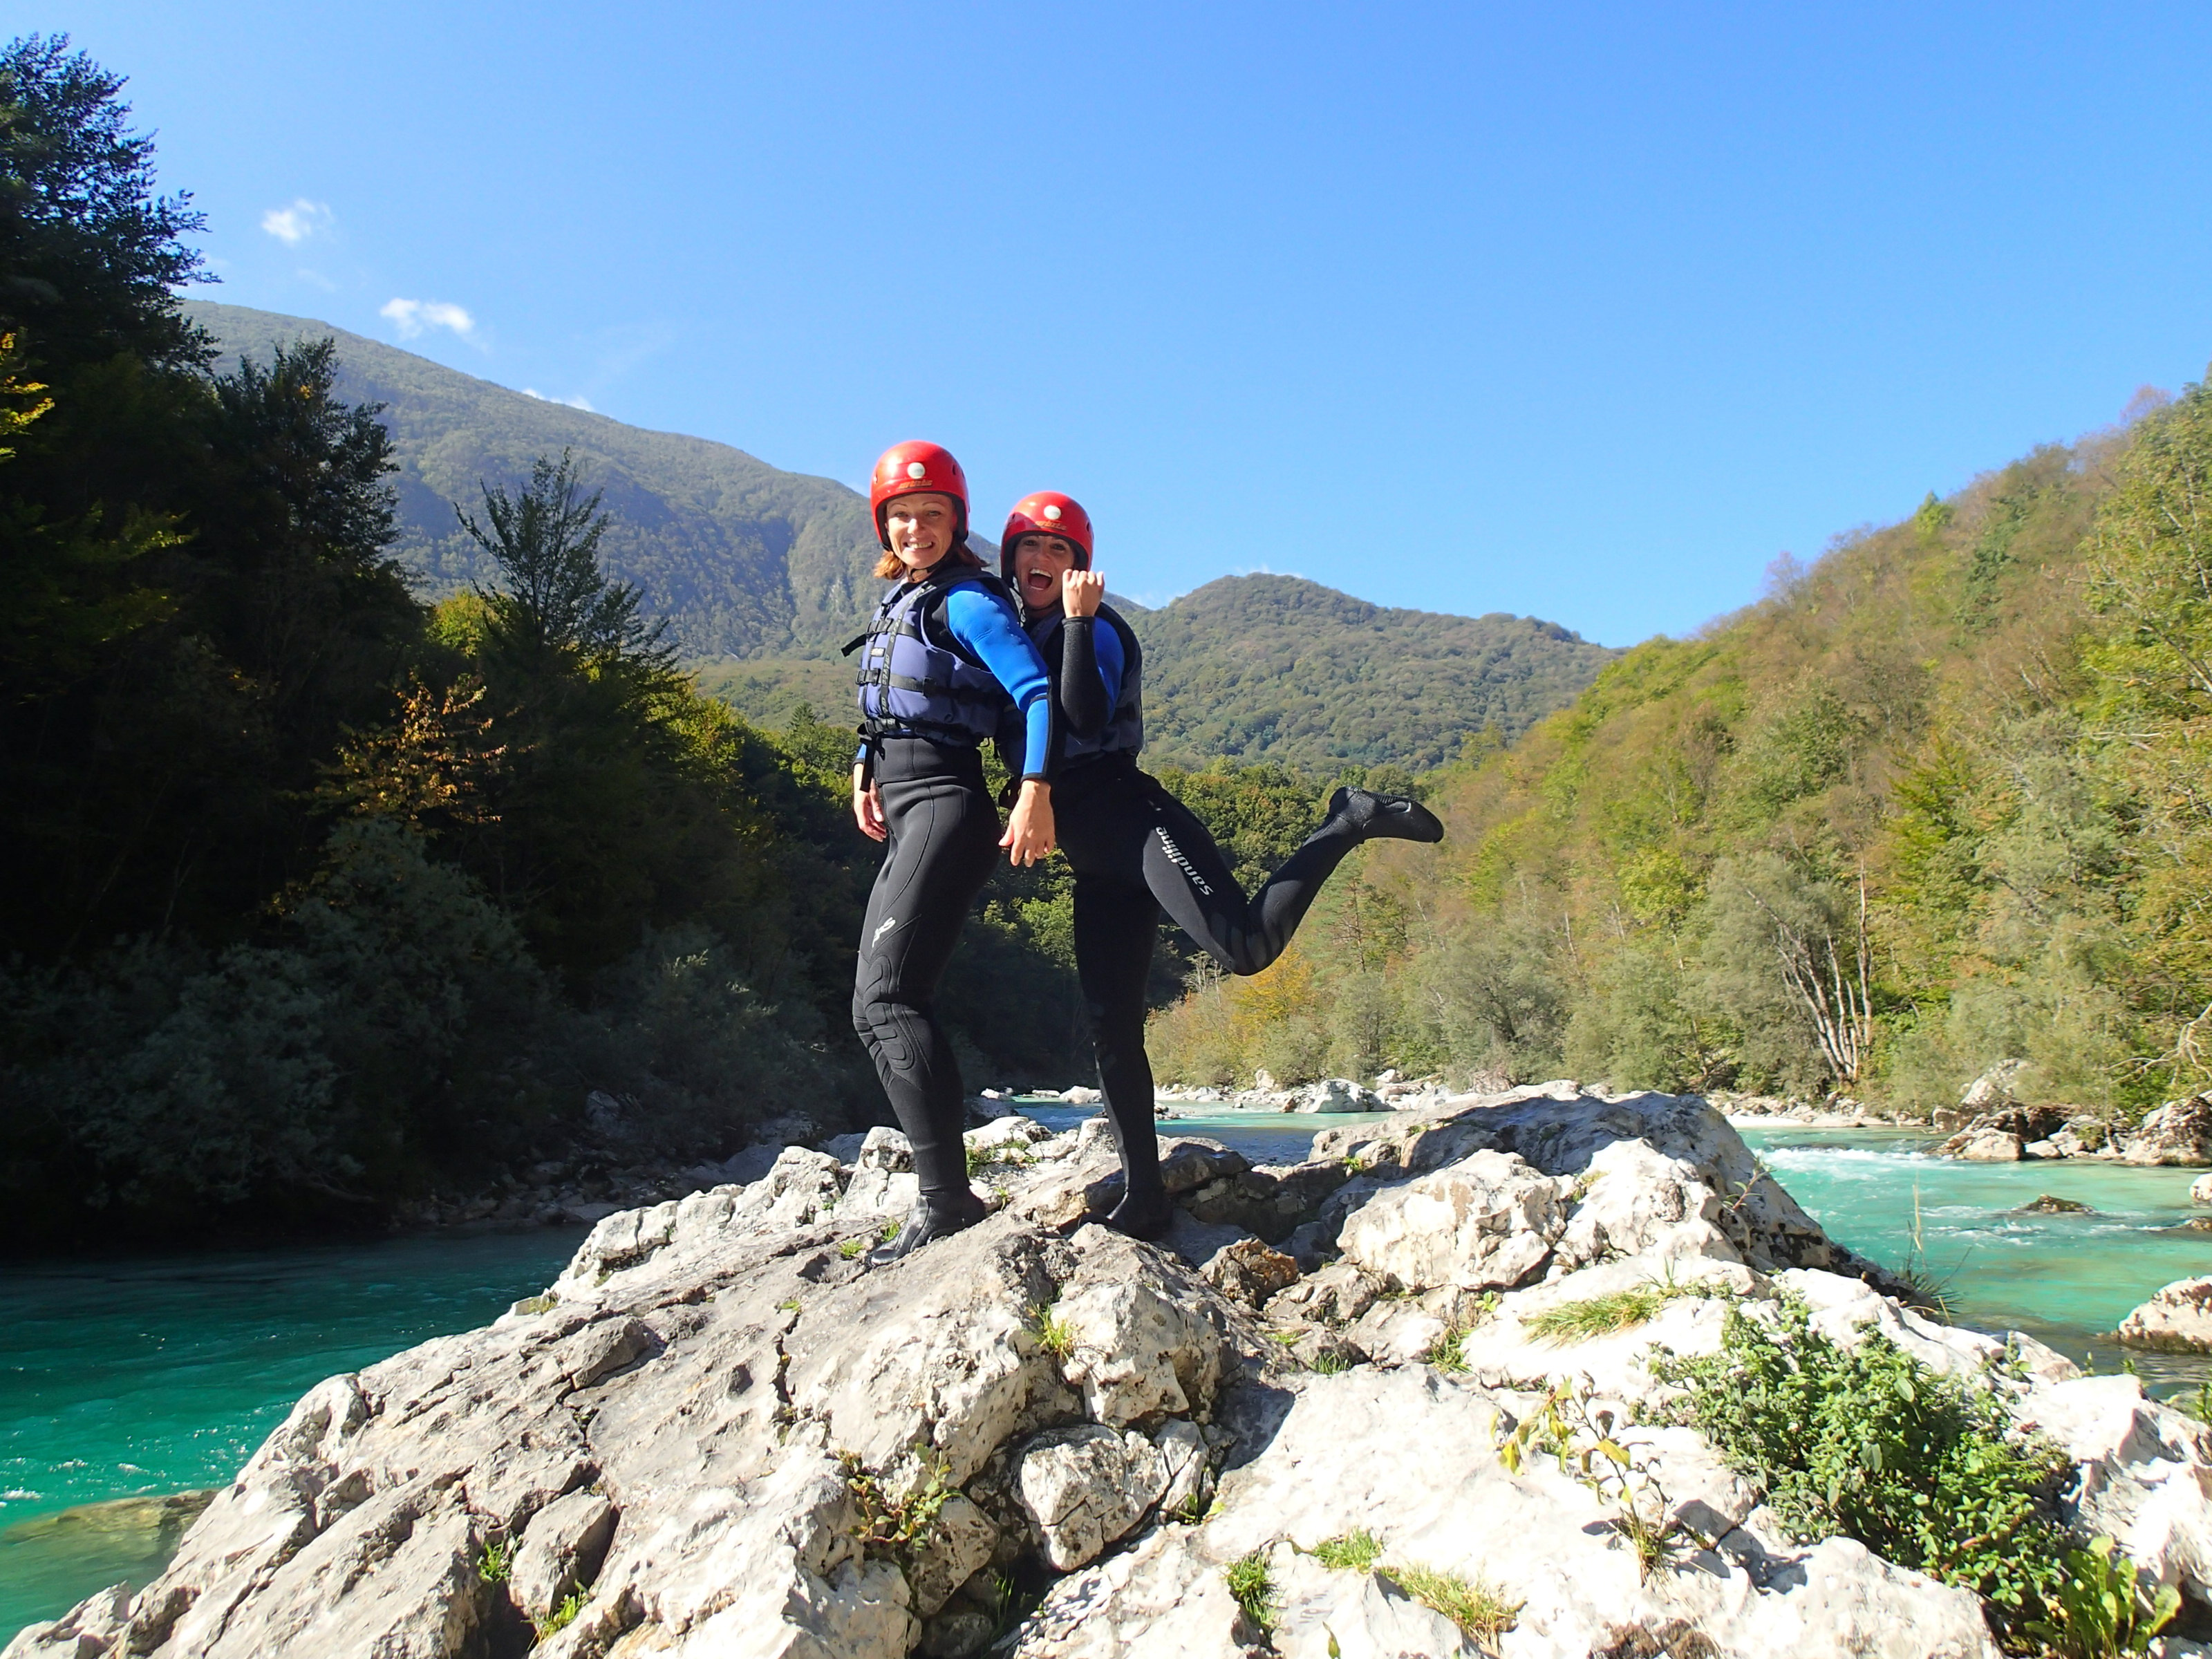 soca_river_rafting_with_hungaroraft.JPG